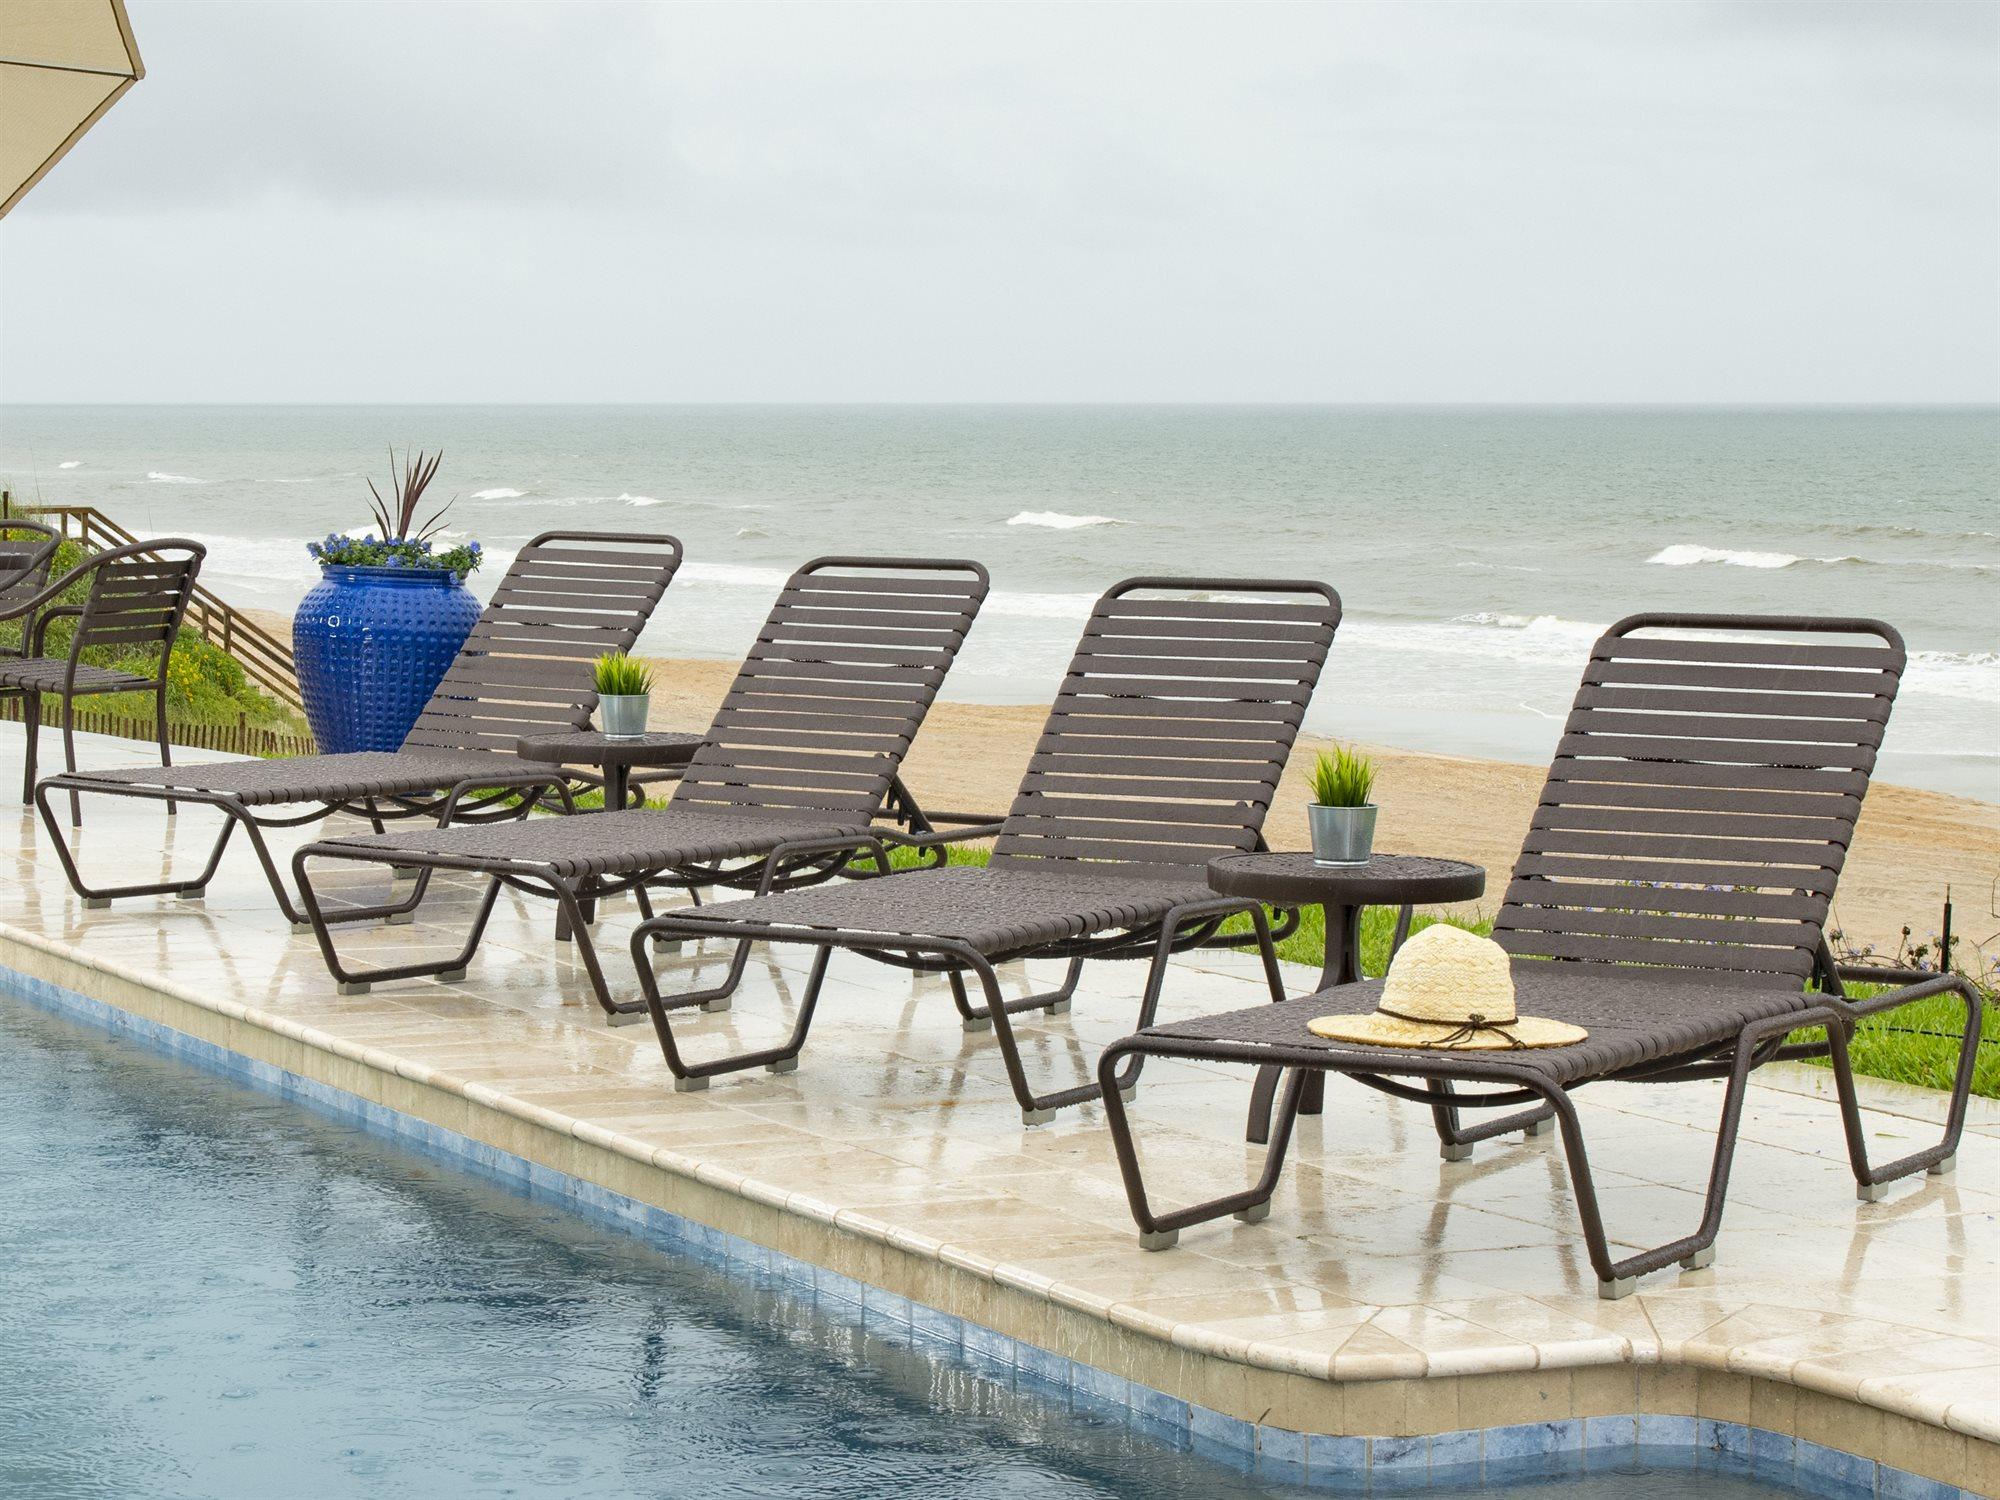 baja beach chairs used knoll woodard strap aluminum chaise lounge wr23m470